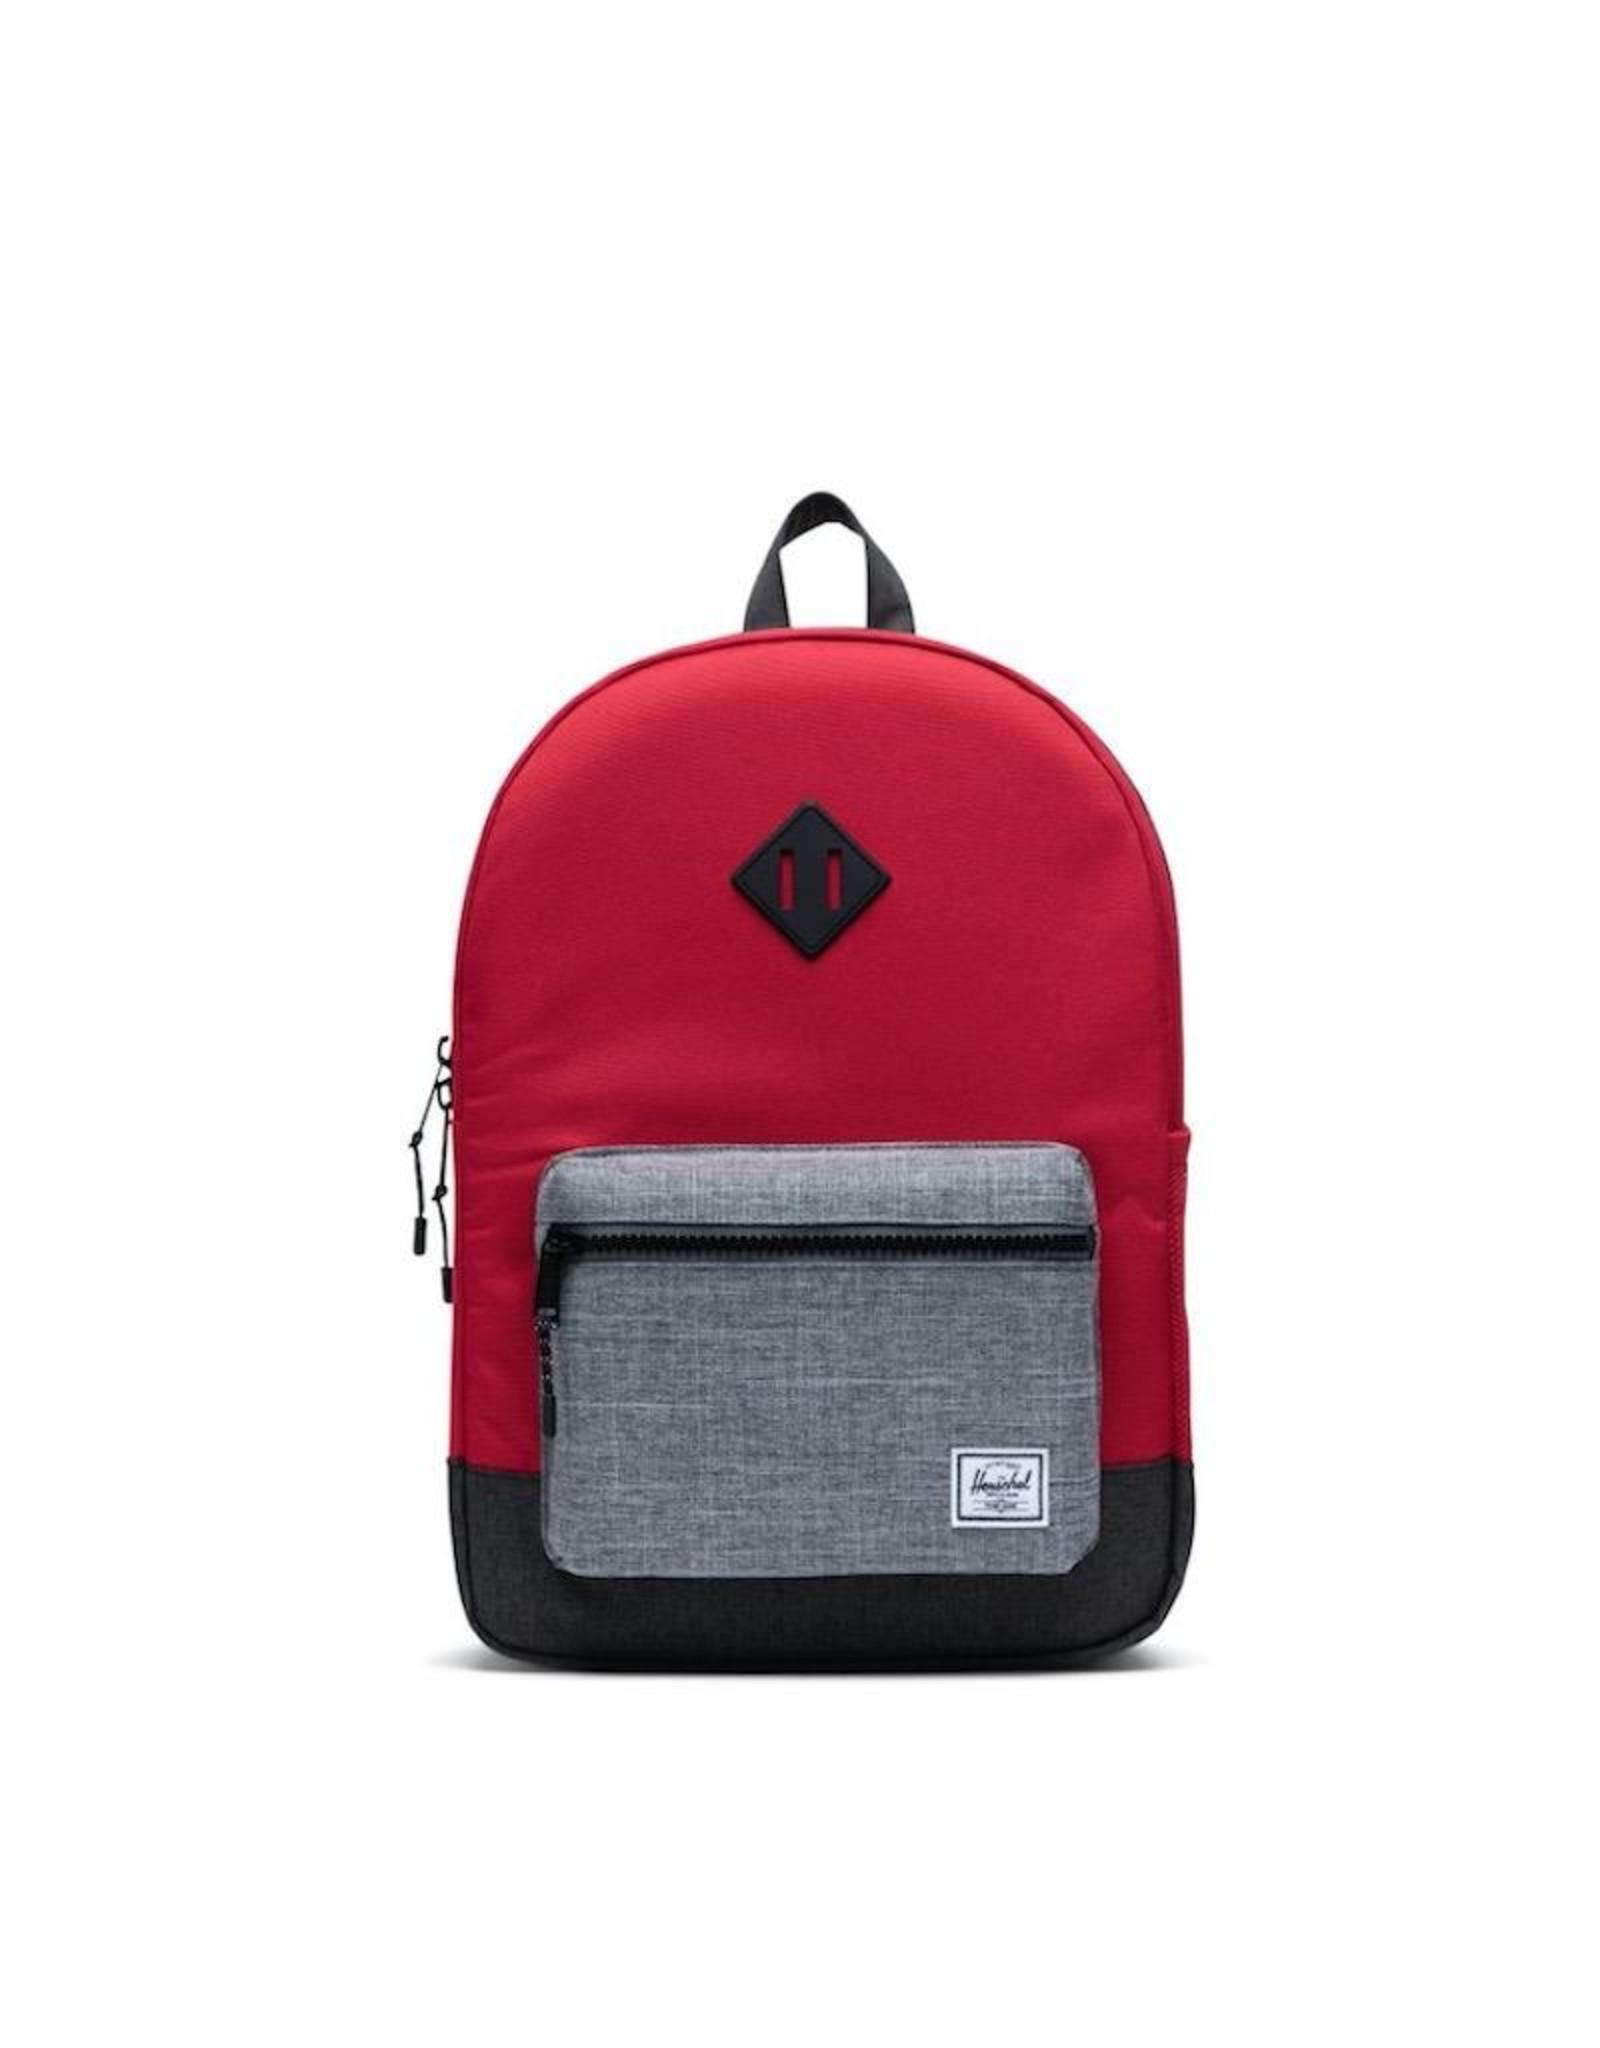 Herschel Supply Co. Herschel Supply, Heritage Backpack | Youth XL, Red/Raven Crosshatch/Black Crosshatch, 22L